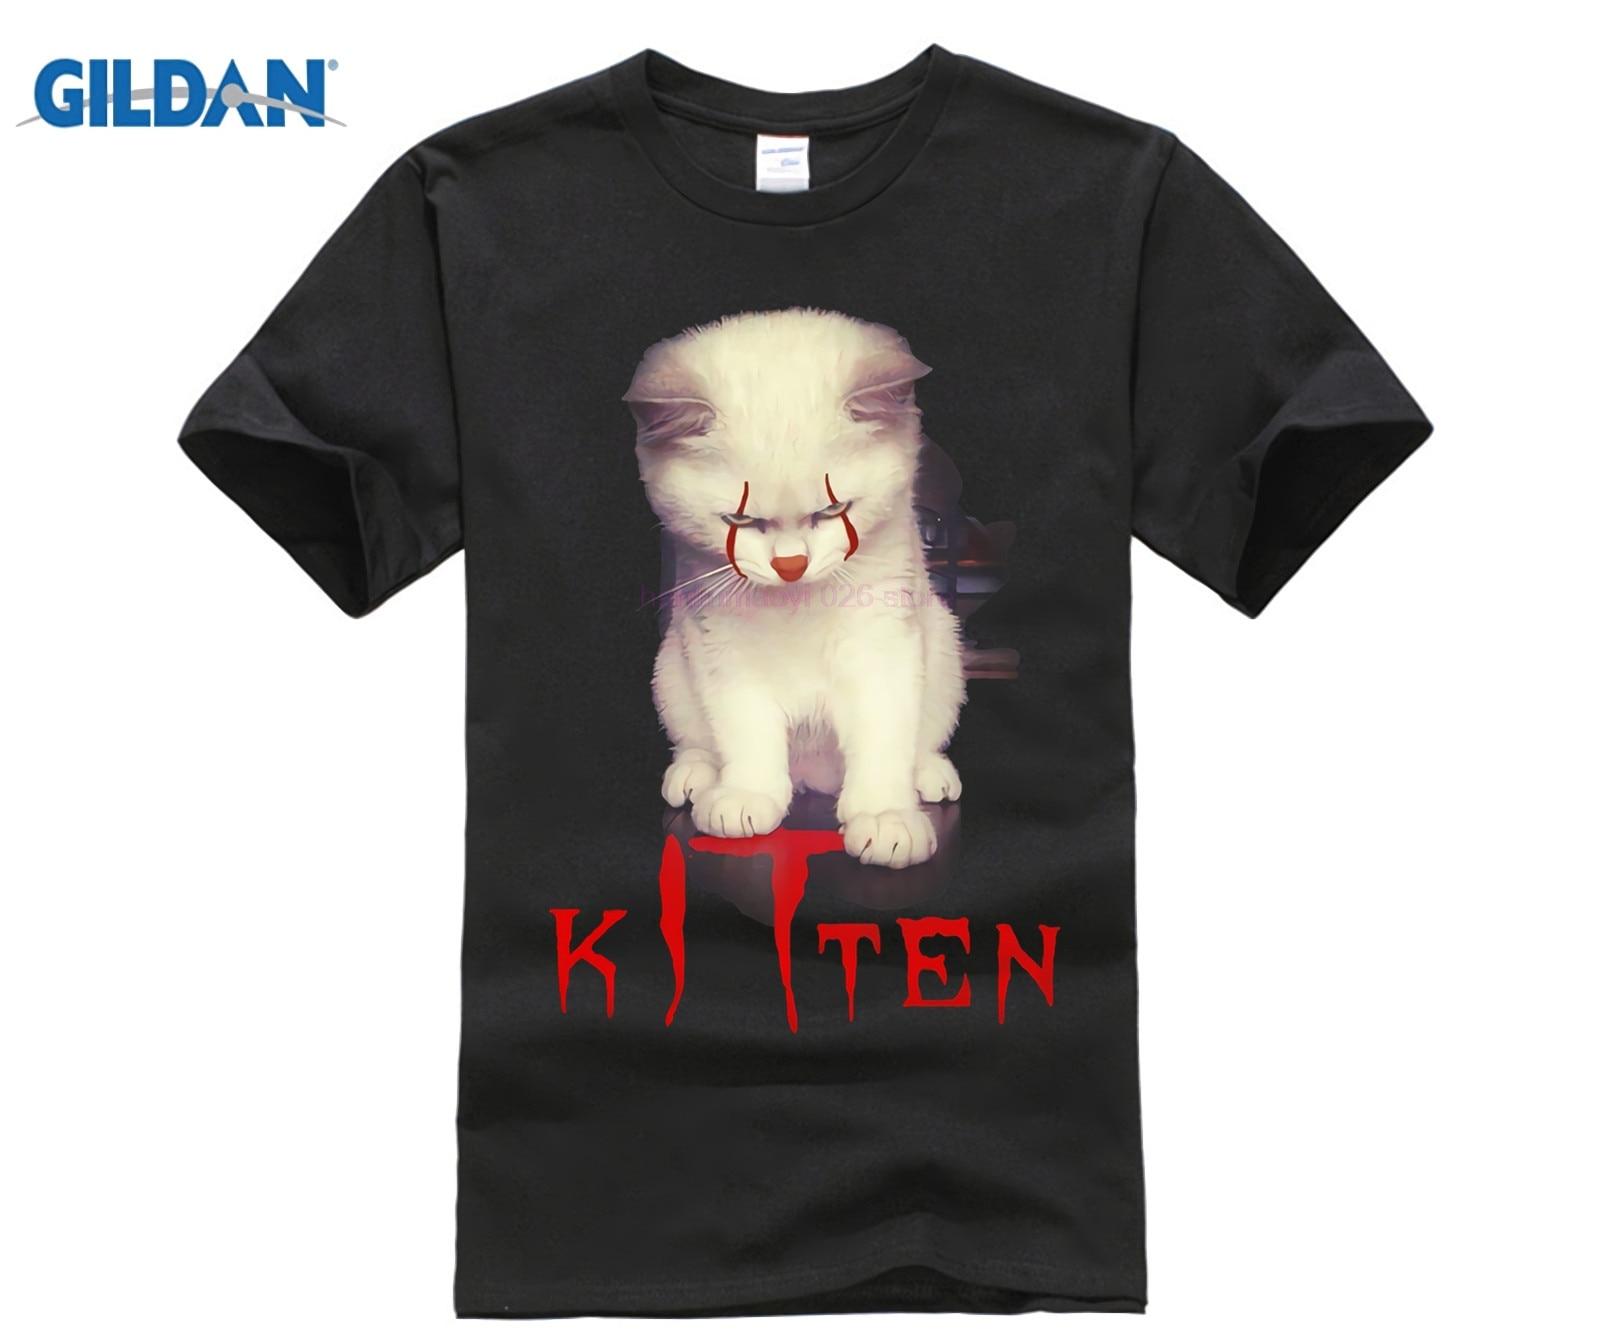 IT Pennywise KITtywise Kitten Purrrfect Stephen King Shirts